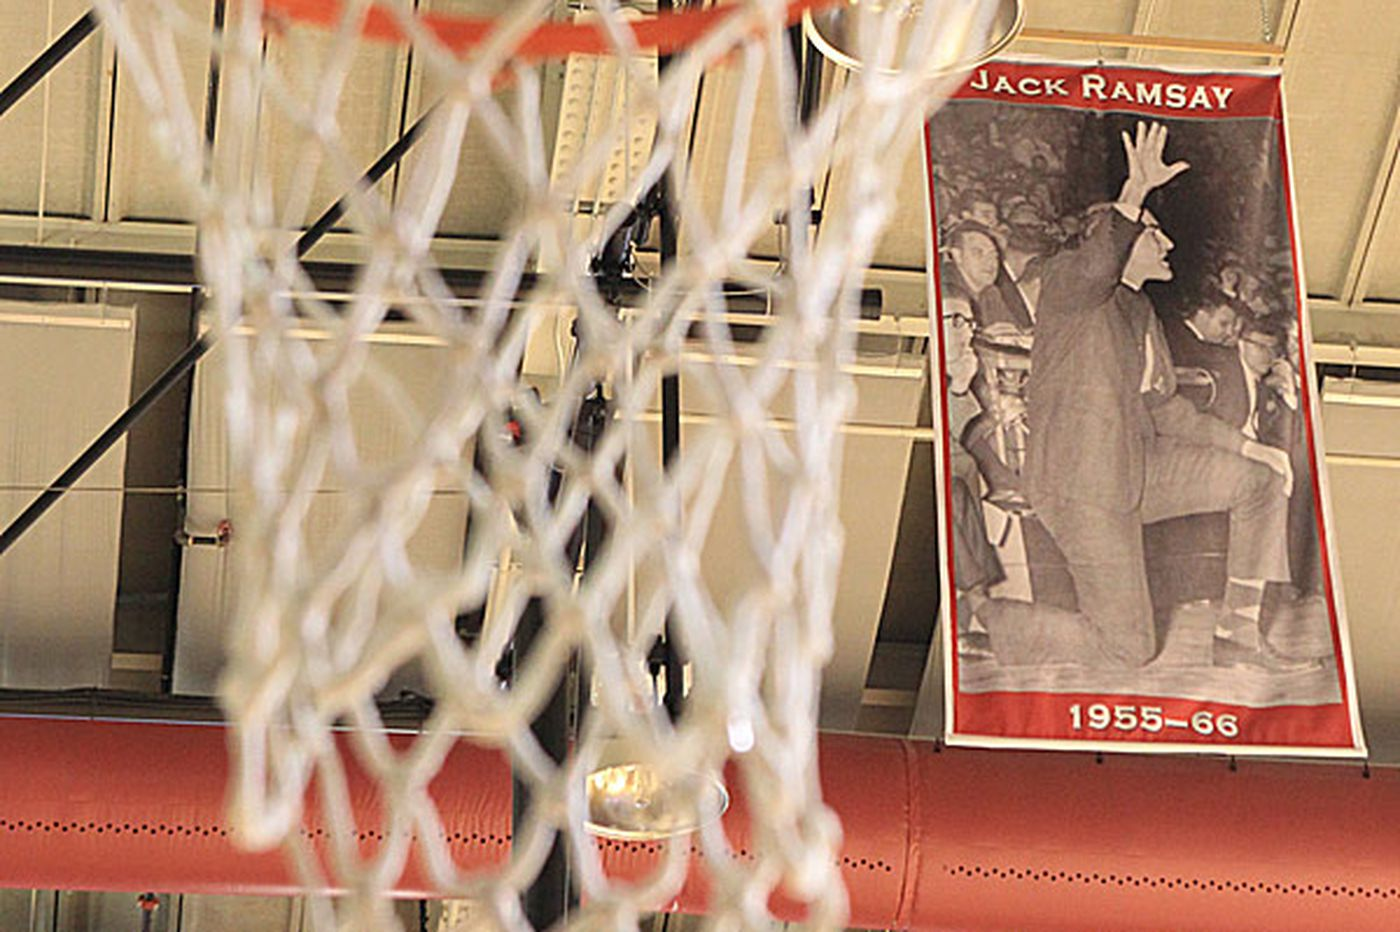 Jack Ramsay: coach, teacher, mentor